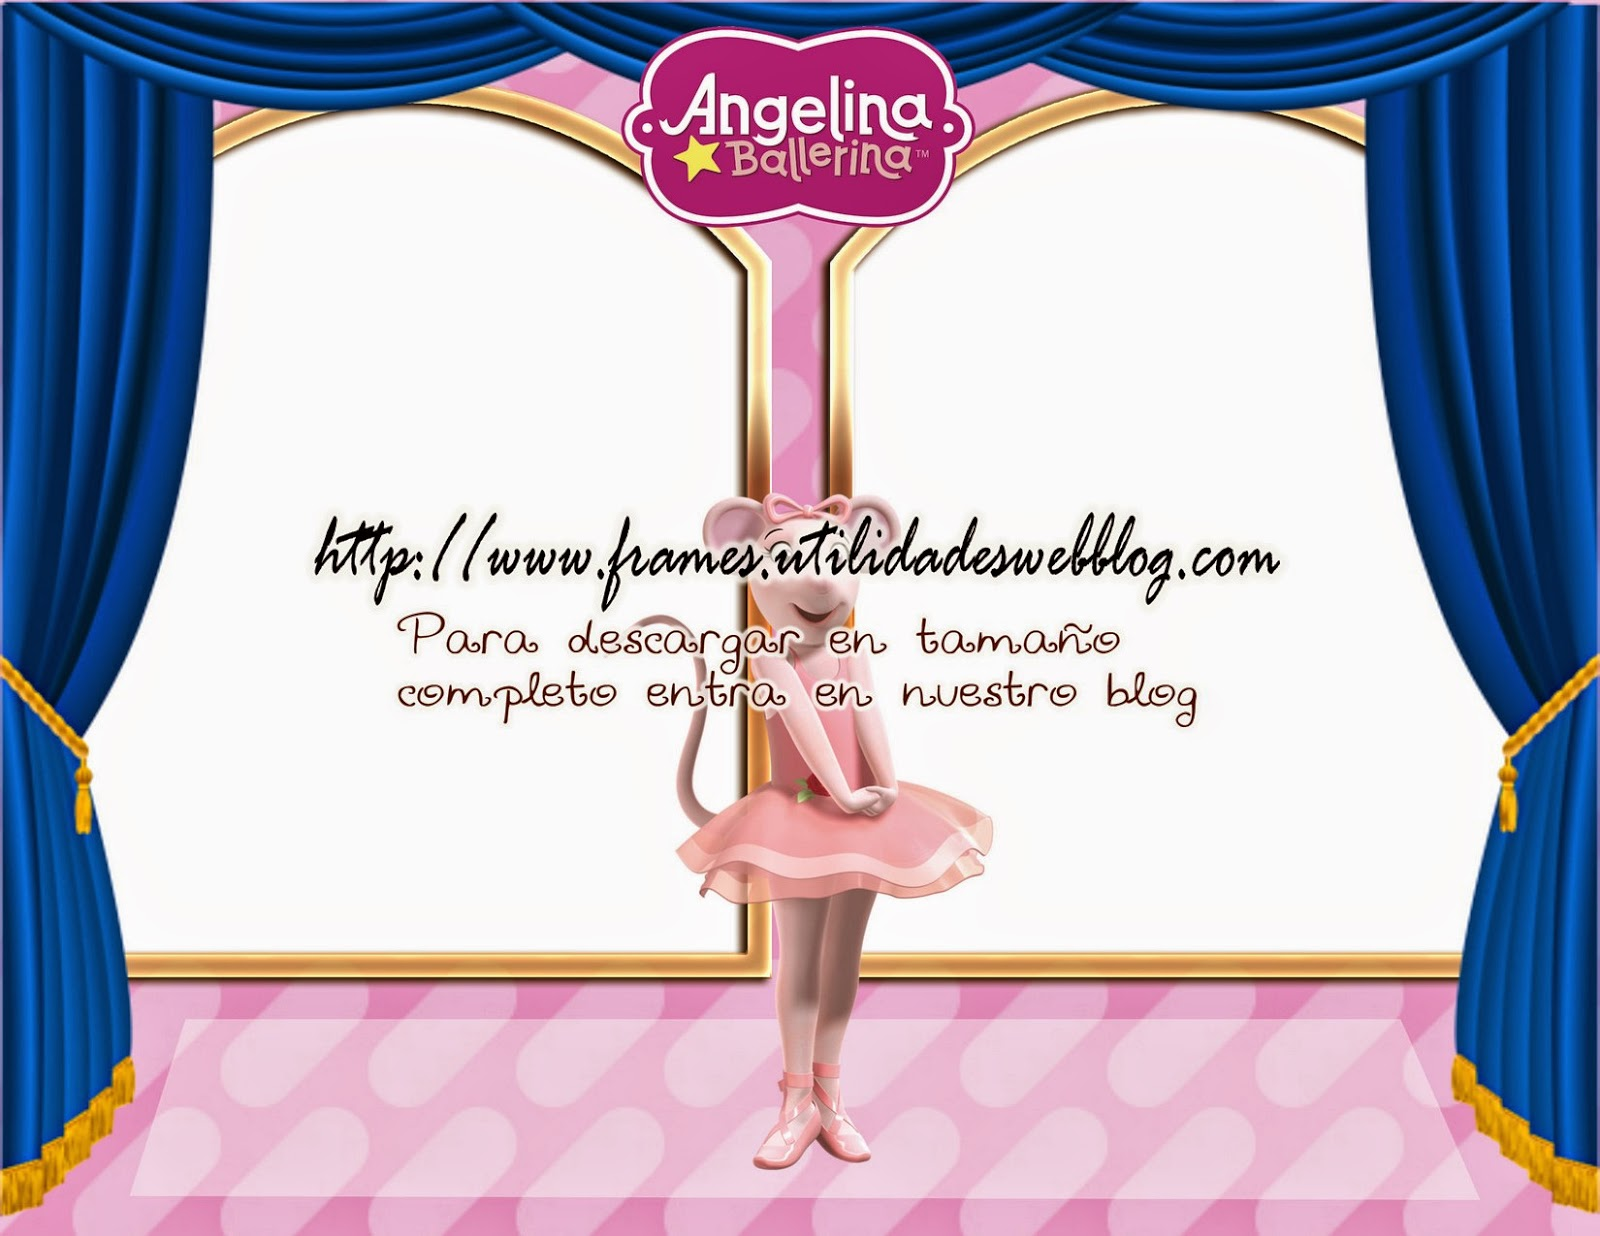 Portaretrato para fotomontajes de Angelina Ballerina